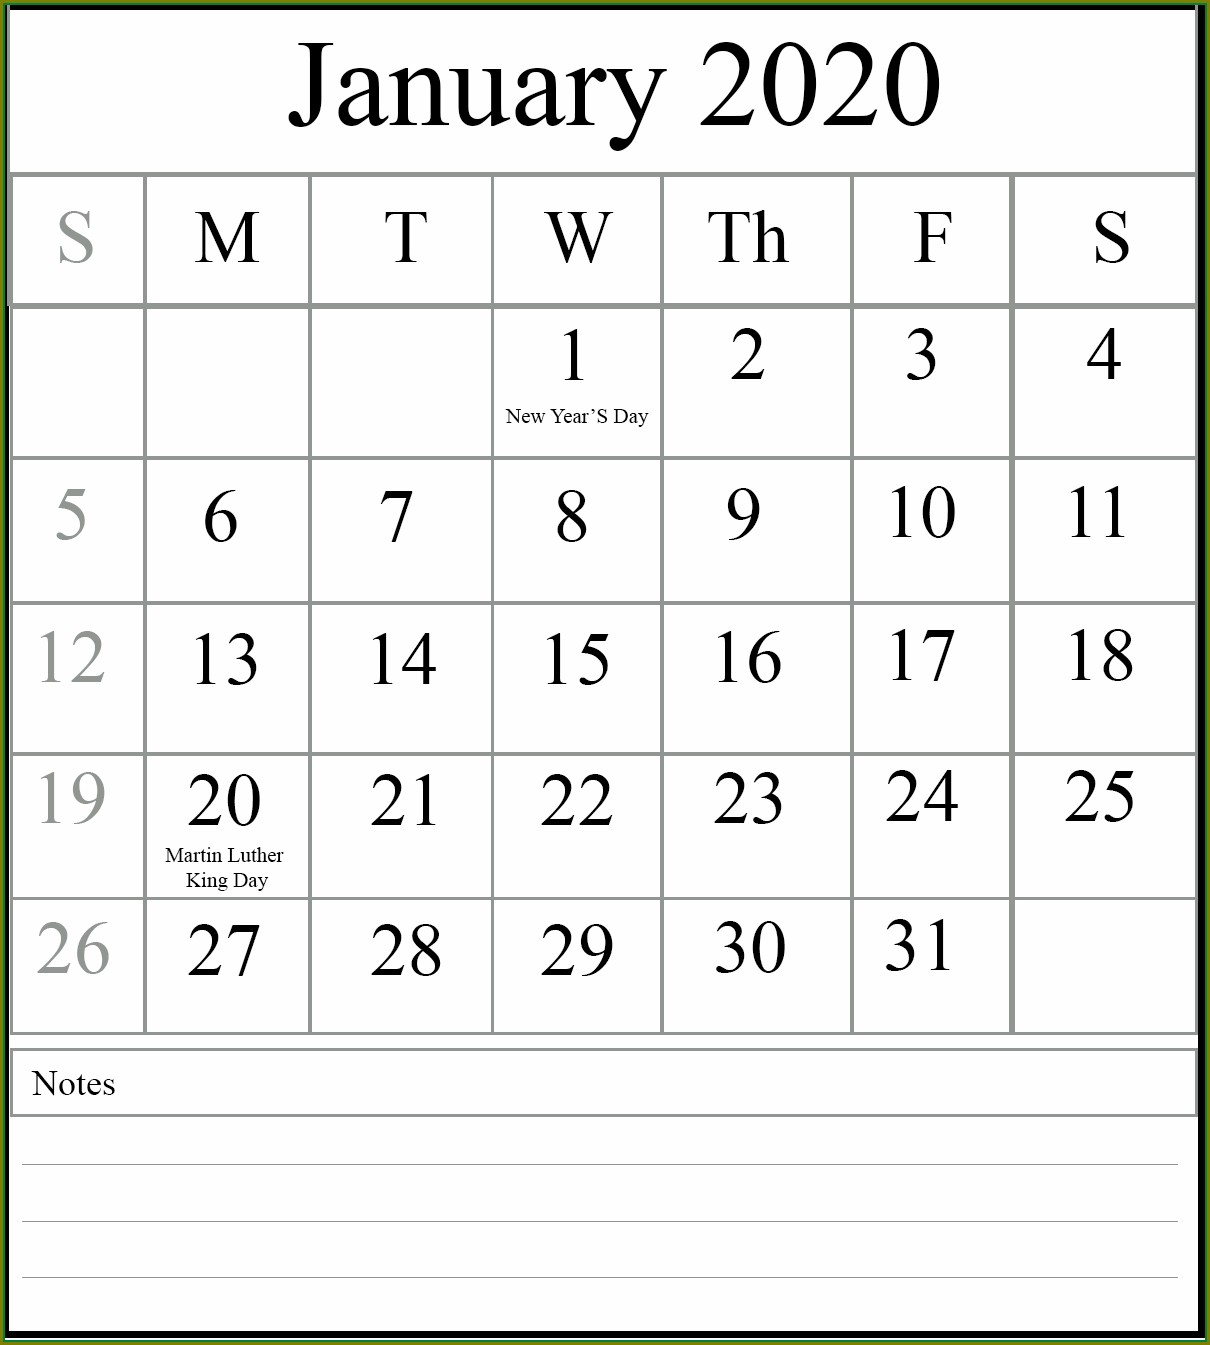 Large Print January 2020 Calendar Template